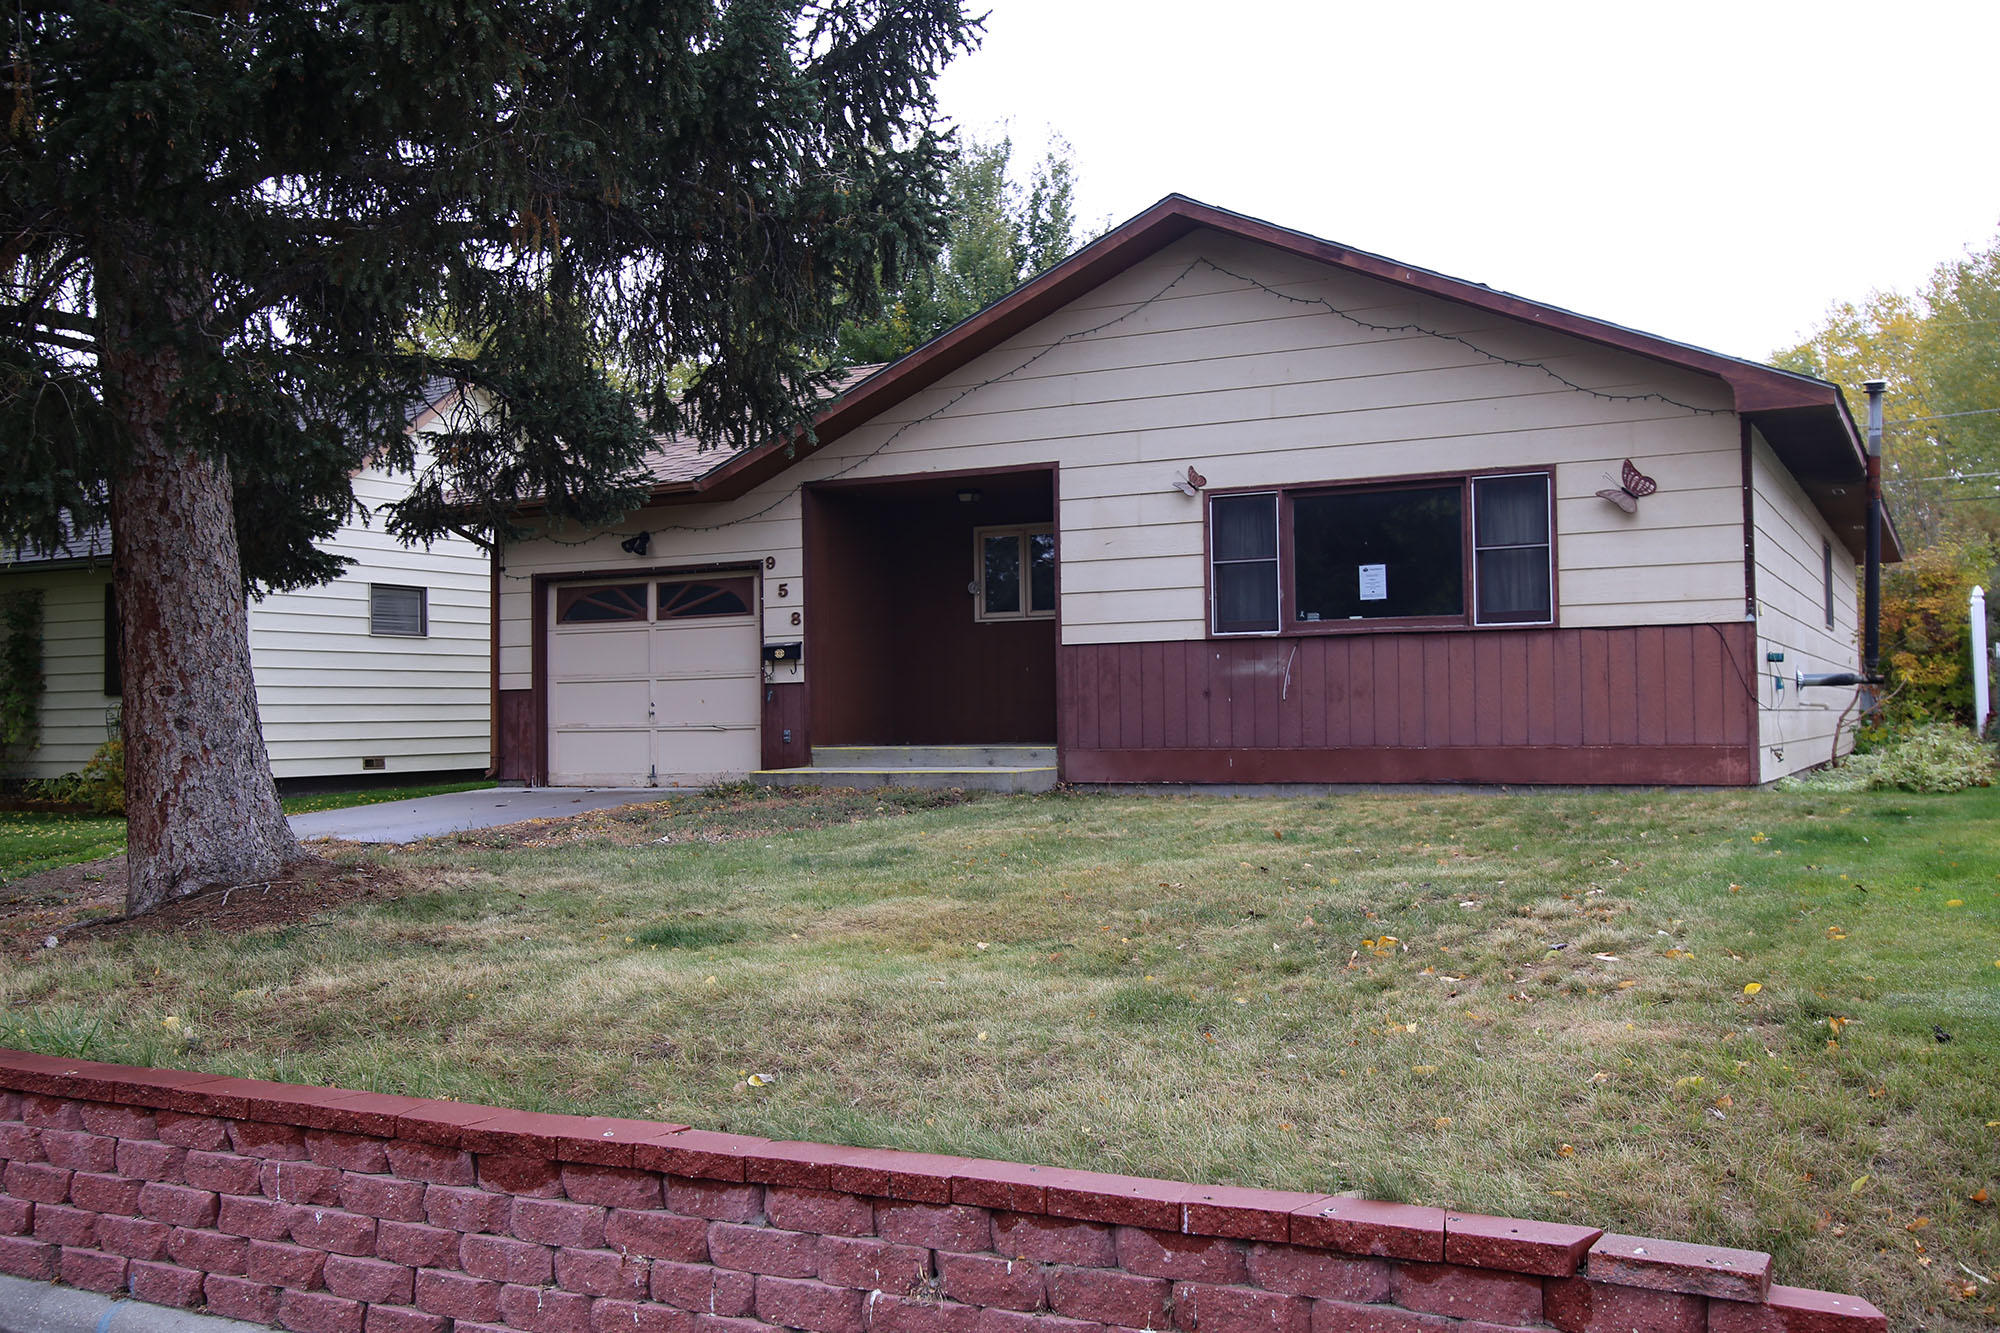 958 N Burritt Avenue, Buffalo, Wyoming 82834, 3 Bedrooms Bedrooms, ,2 BathroomsBathrooms,Residential,For Sale,Burritt,19-125